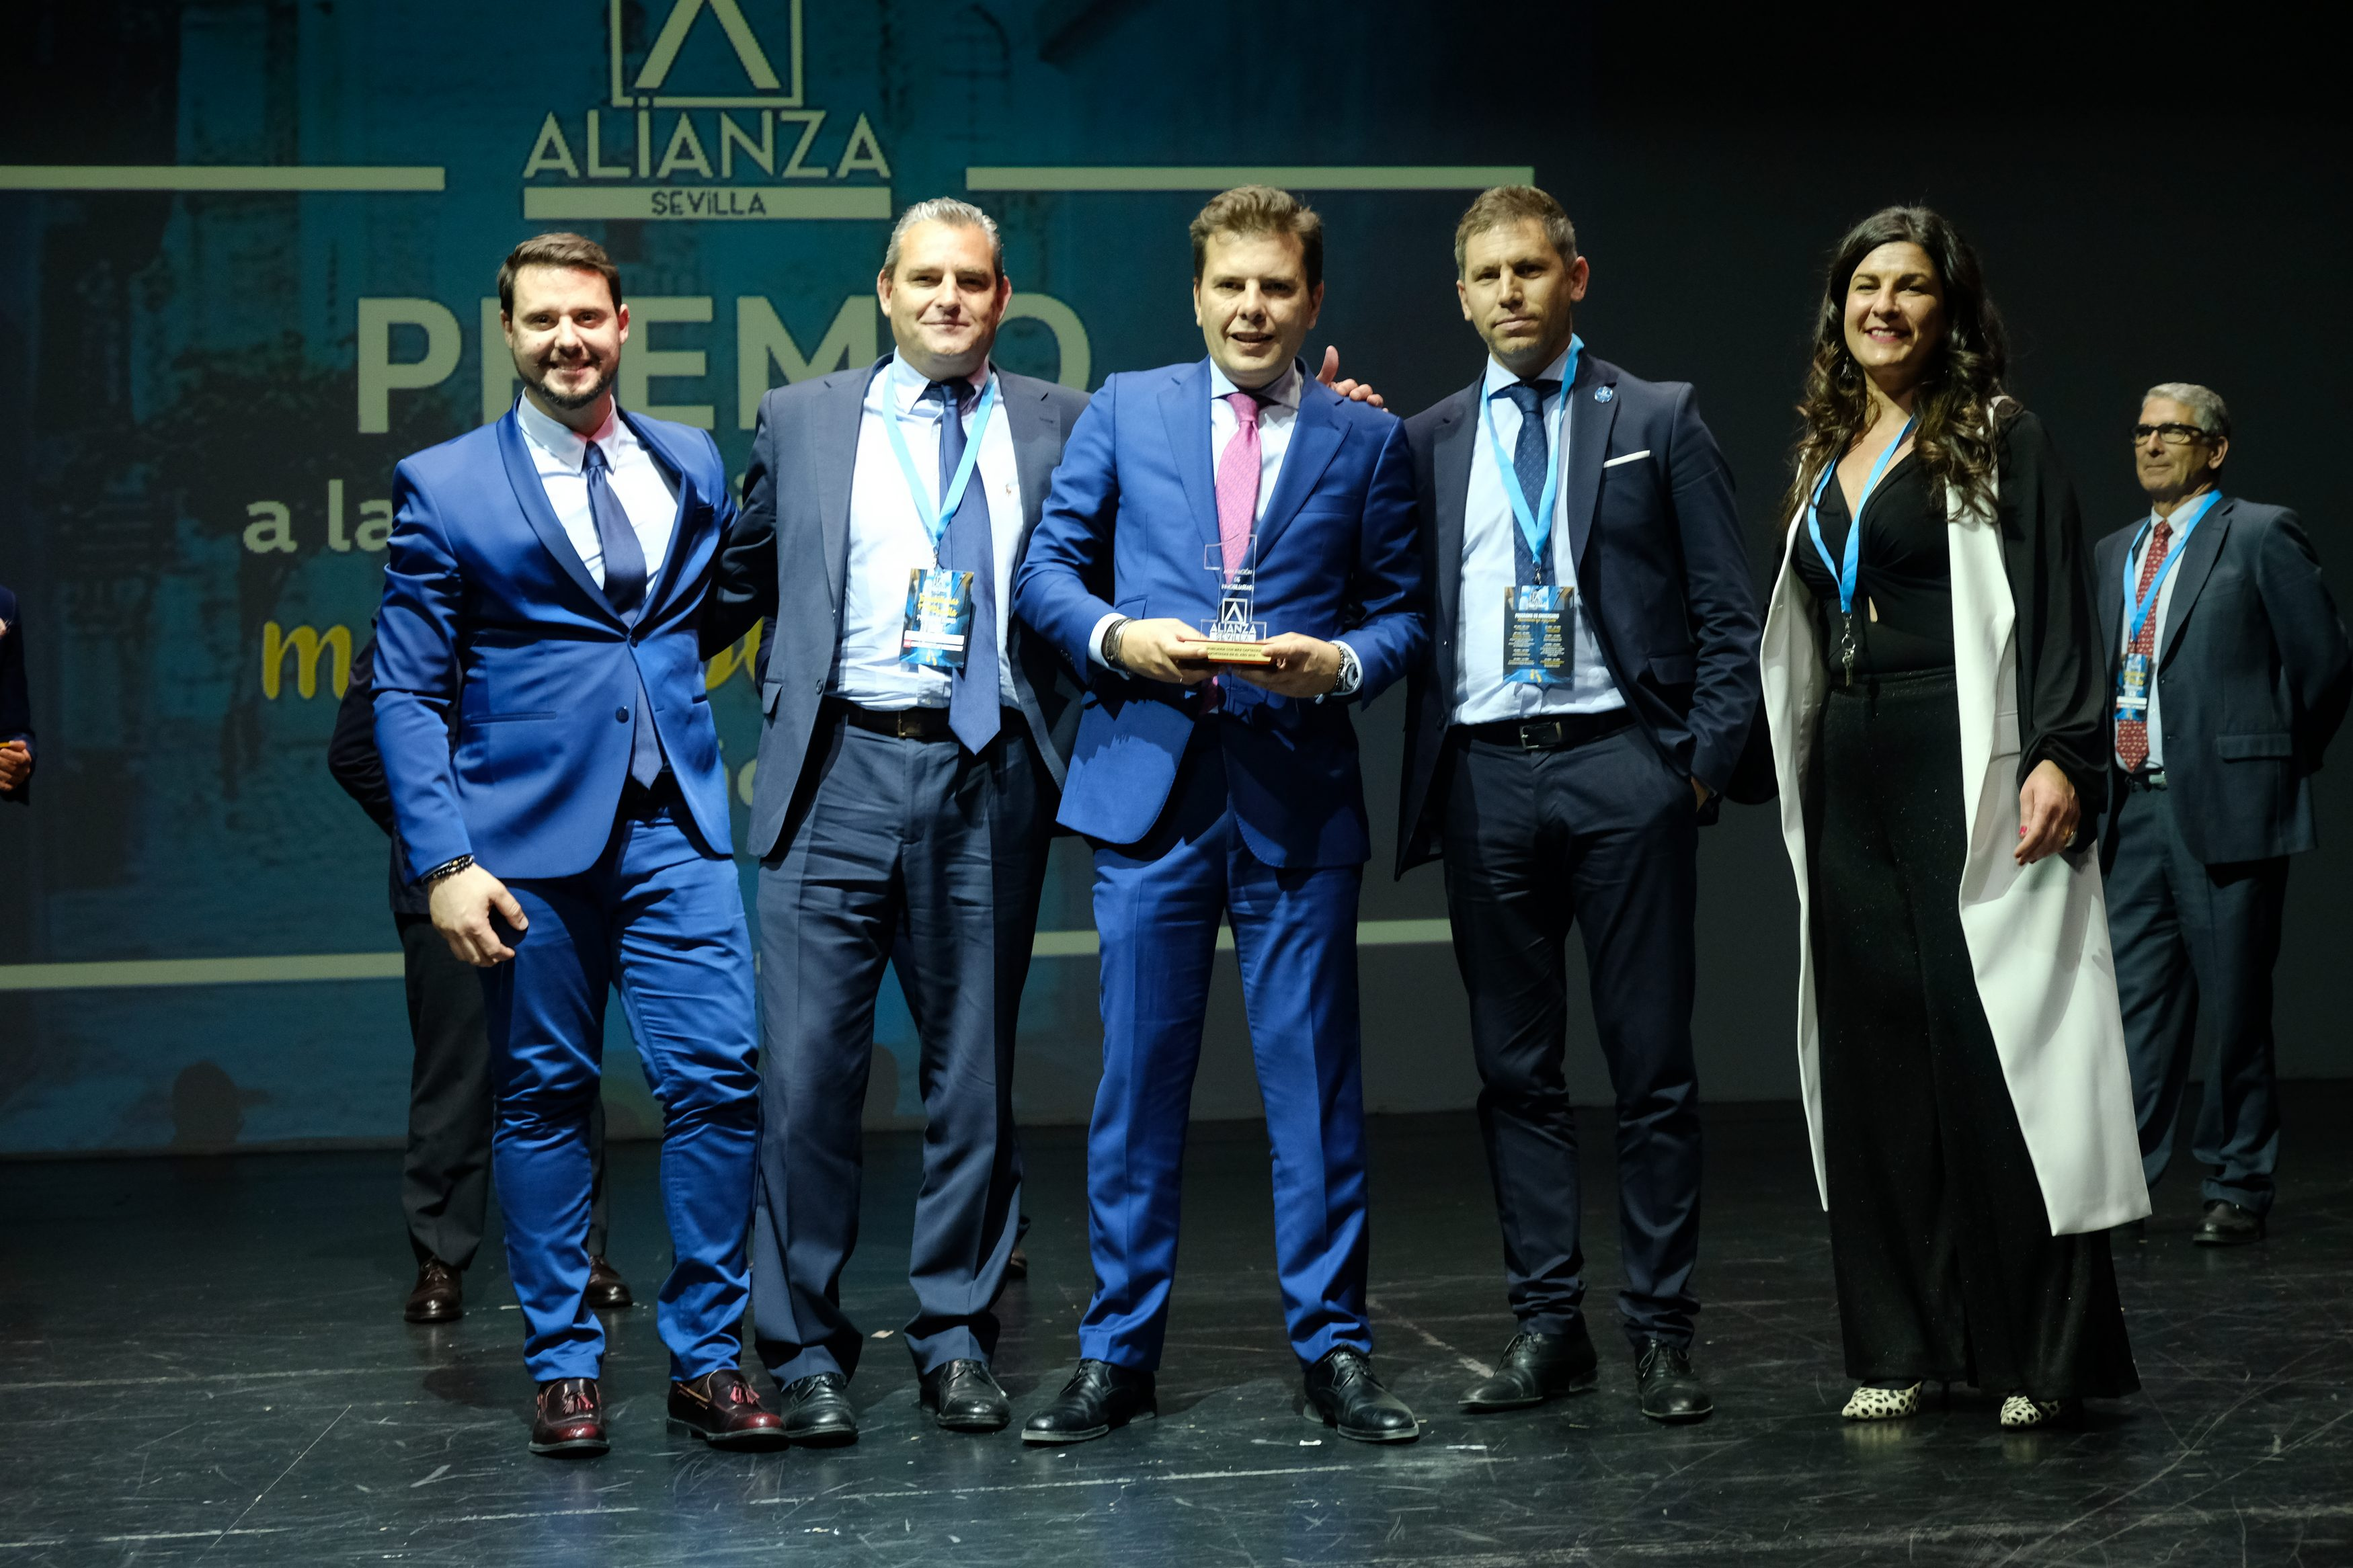 vivenzia-premio-captacion-2019-alianza-1